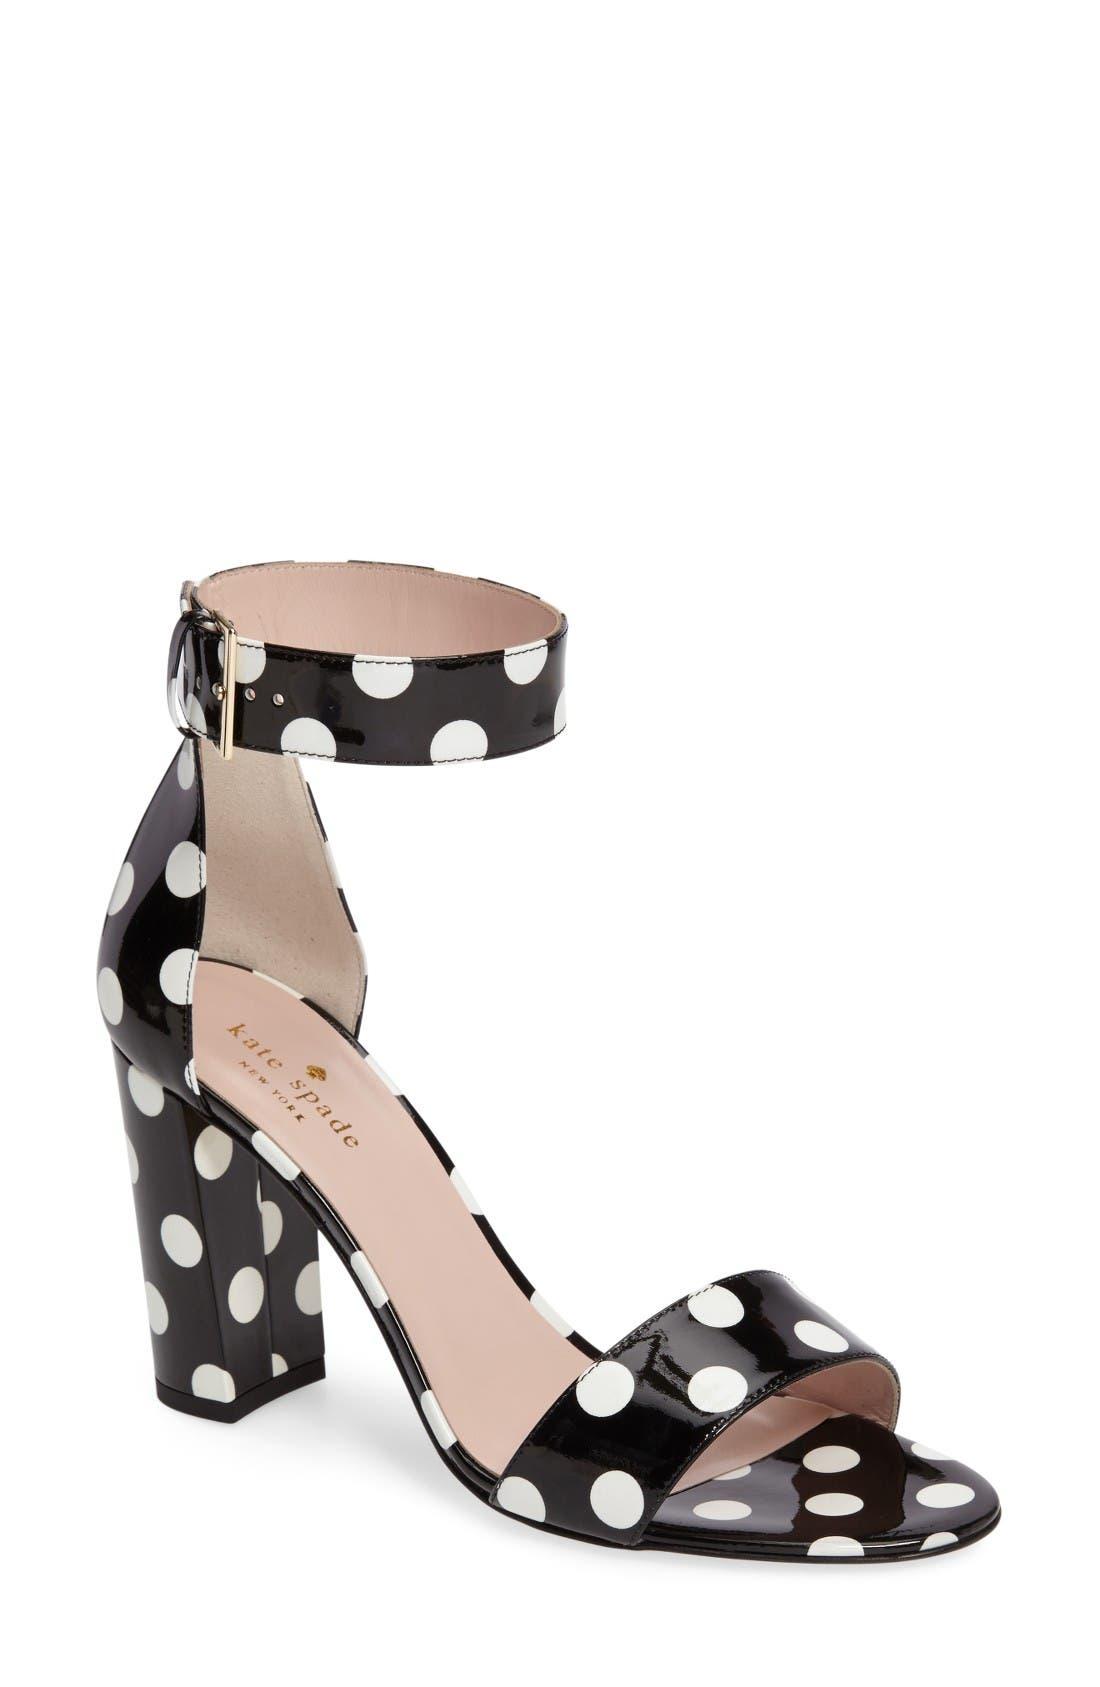 KATE SPADE NEW YORK idabelle too sandal